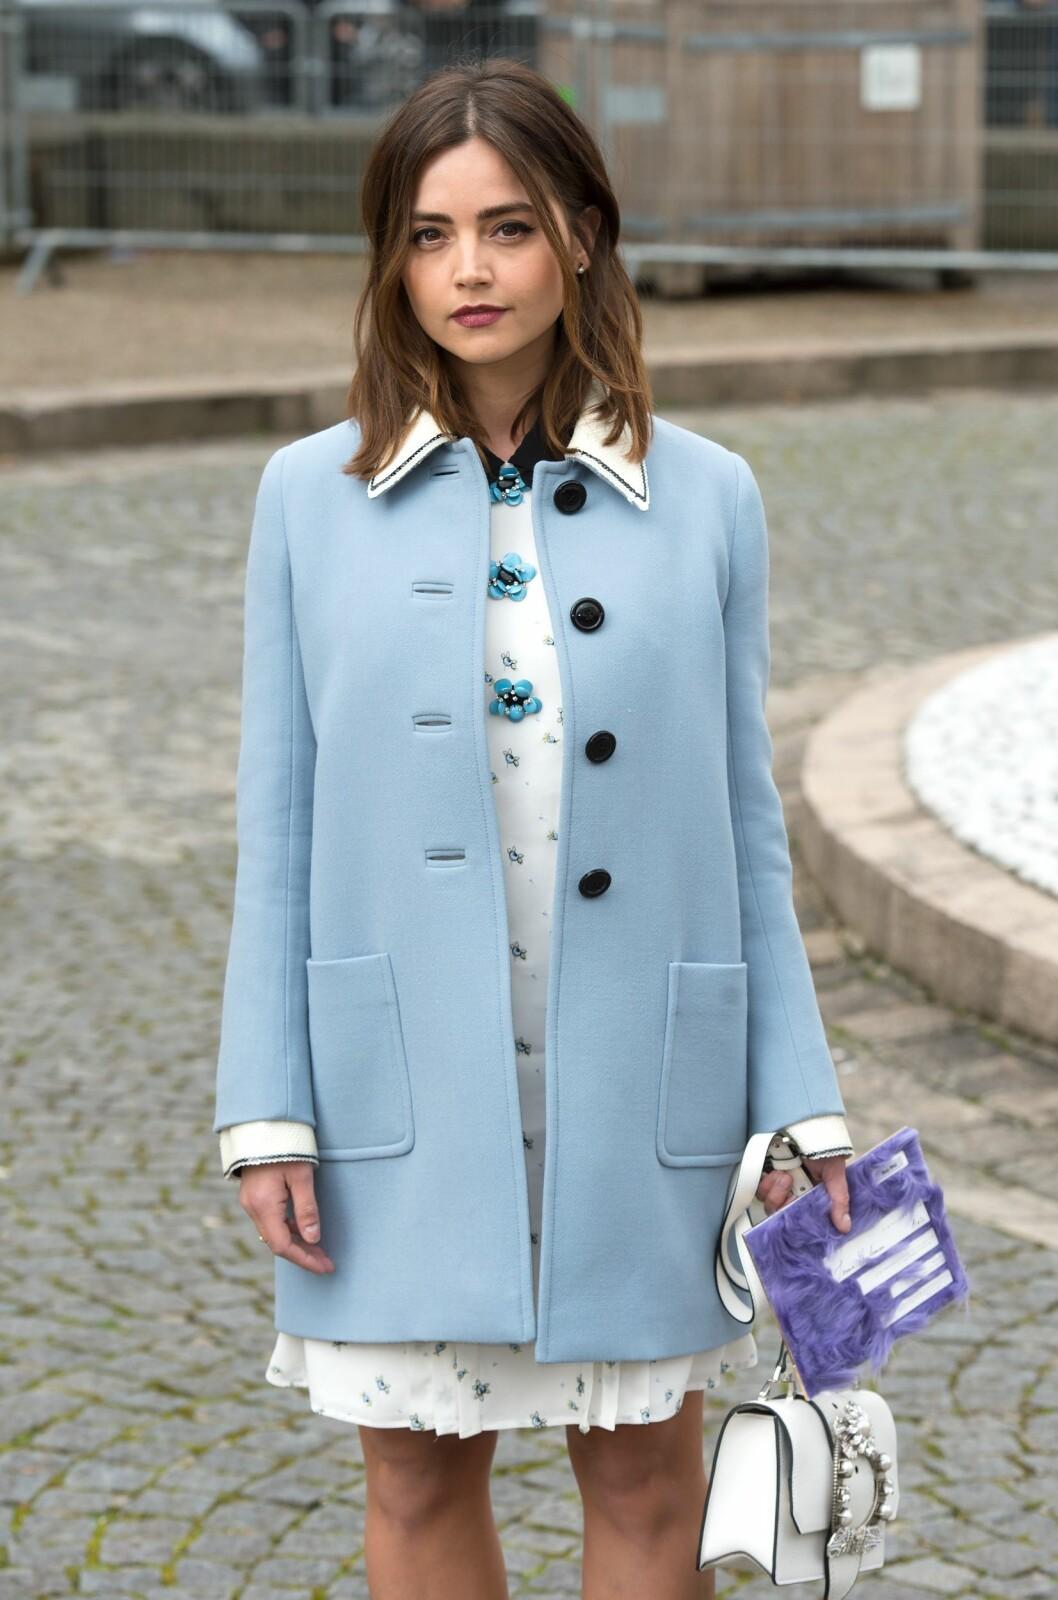 Jenna Coleman Foto: Shutterstock